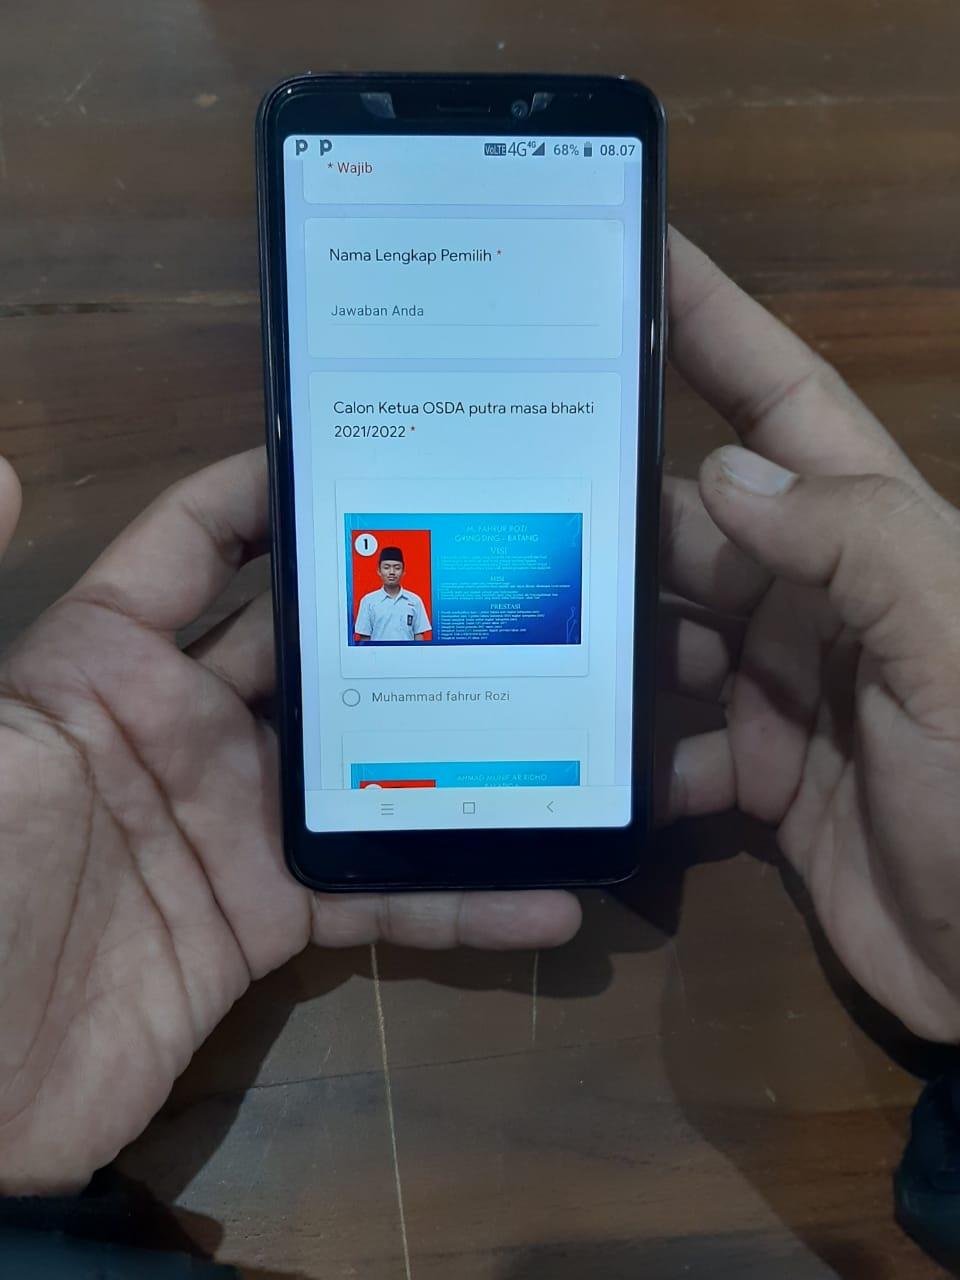 Terapkan Teknologi : Pondok Pesantren Darul Amanah Pilih Kandidat Calon Ketua dan Wakil Ketua OSDA menggunakan E-Voting